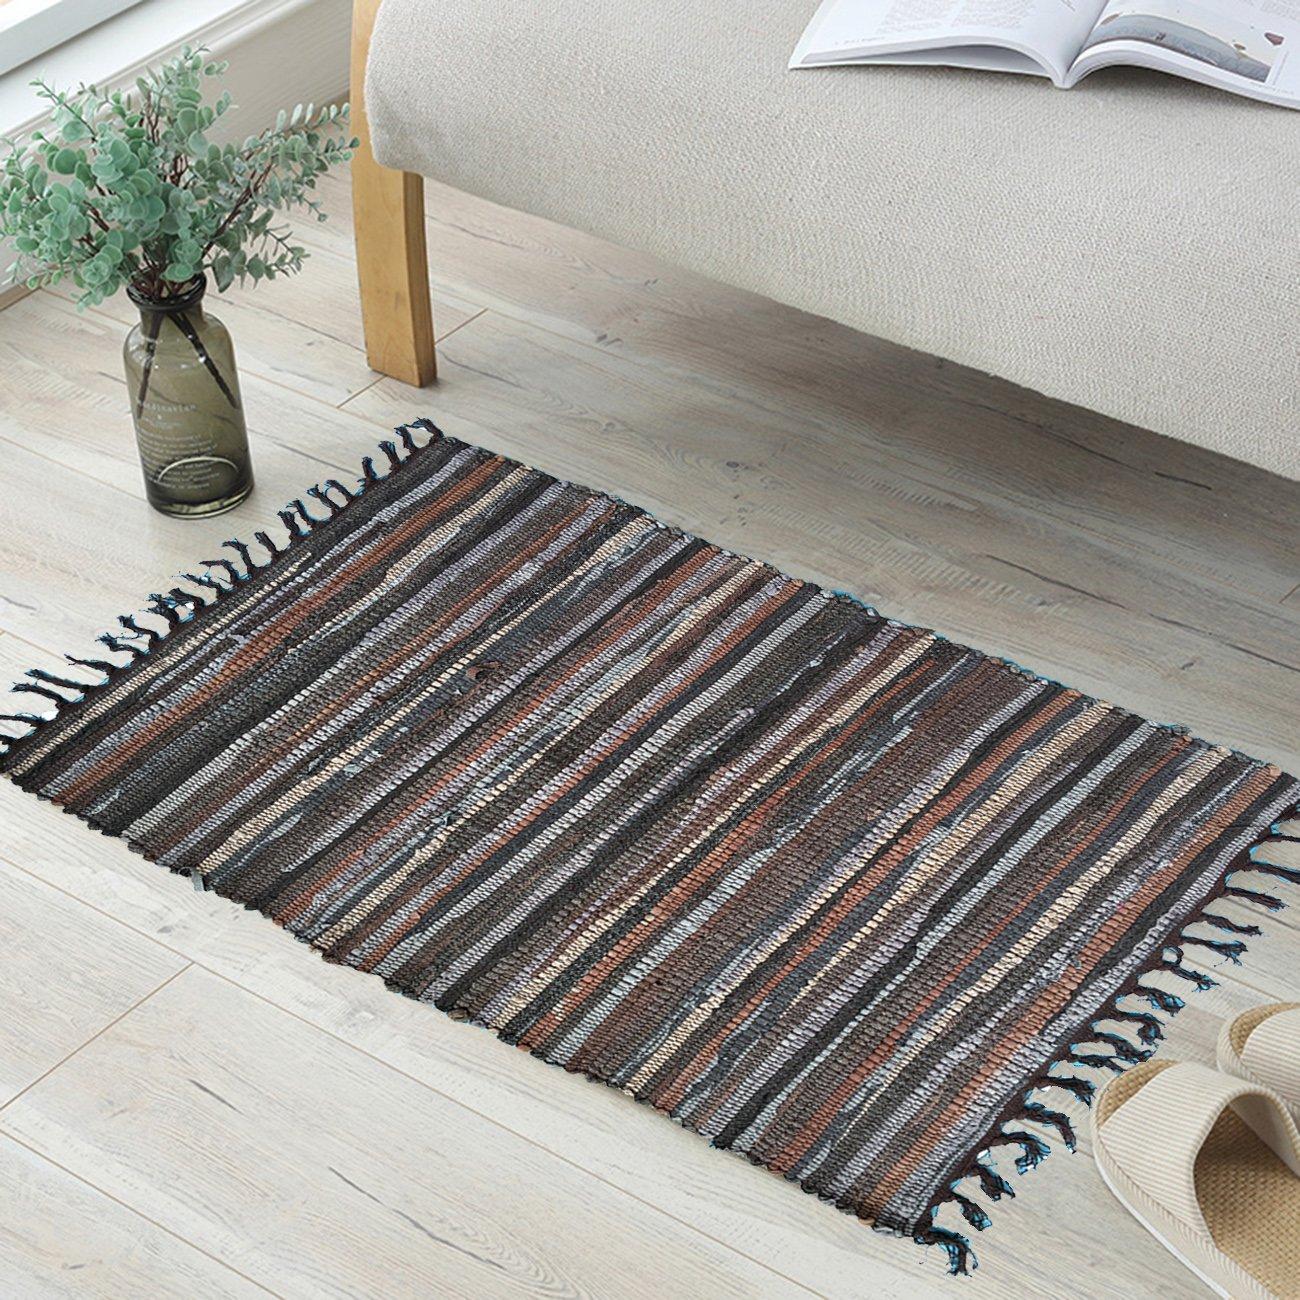 ANJUREN Multifunction Reversible Durable Color Stripe Area Rugs Rags Hand Woven Washable Runner Rug Carpet Mat Pad For Kitchen Bathroom Door Bedroom Apartment Sofa Window Bed Pet (23.6''x35.4'', Coffee)